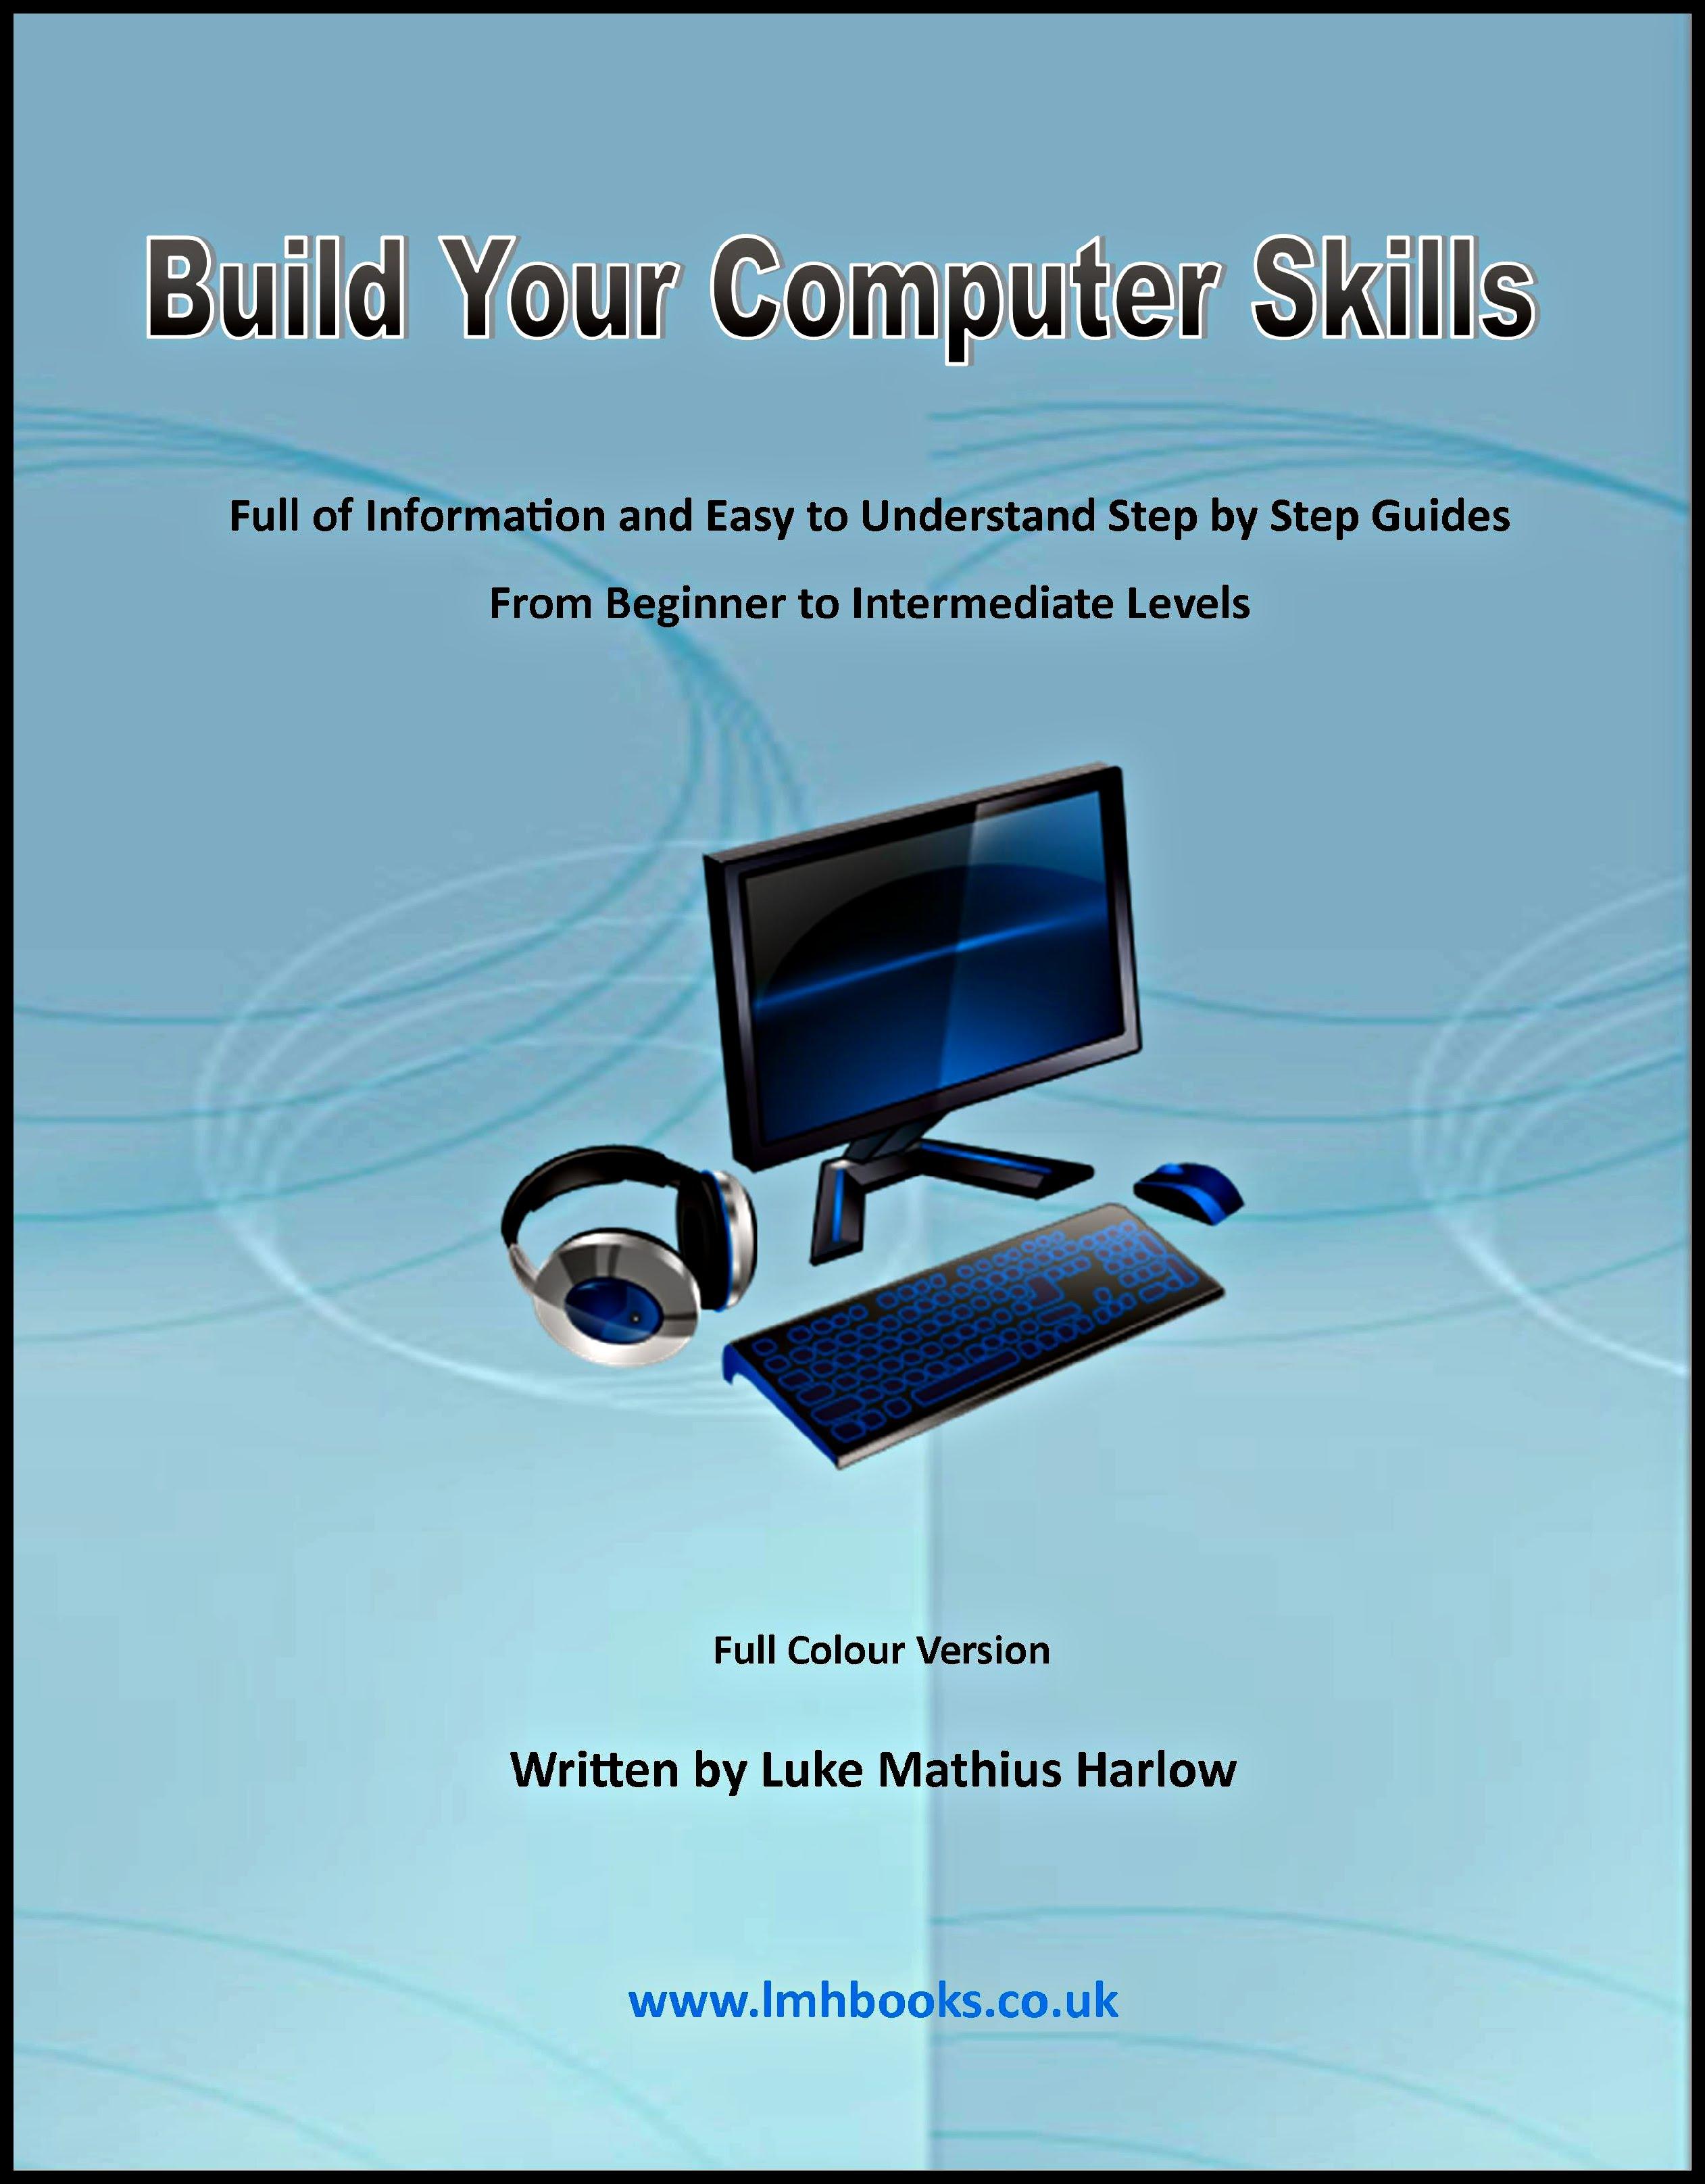 http://www.amazon.co.uk/Build-Computer-Skills-Mathius-Harlow/dp/1505246296/ref=asap_bc?ie=UTF8